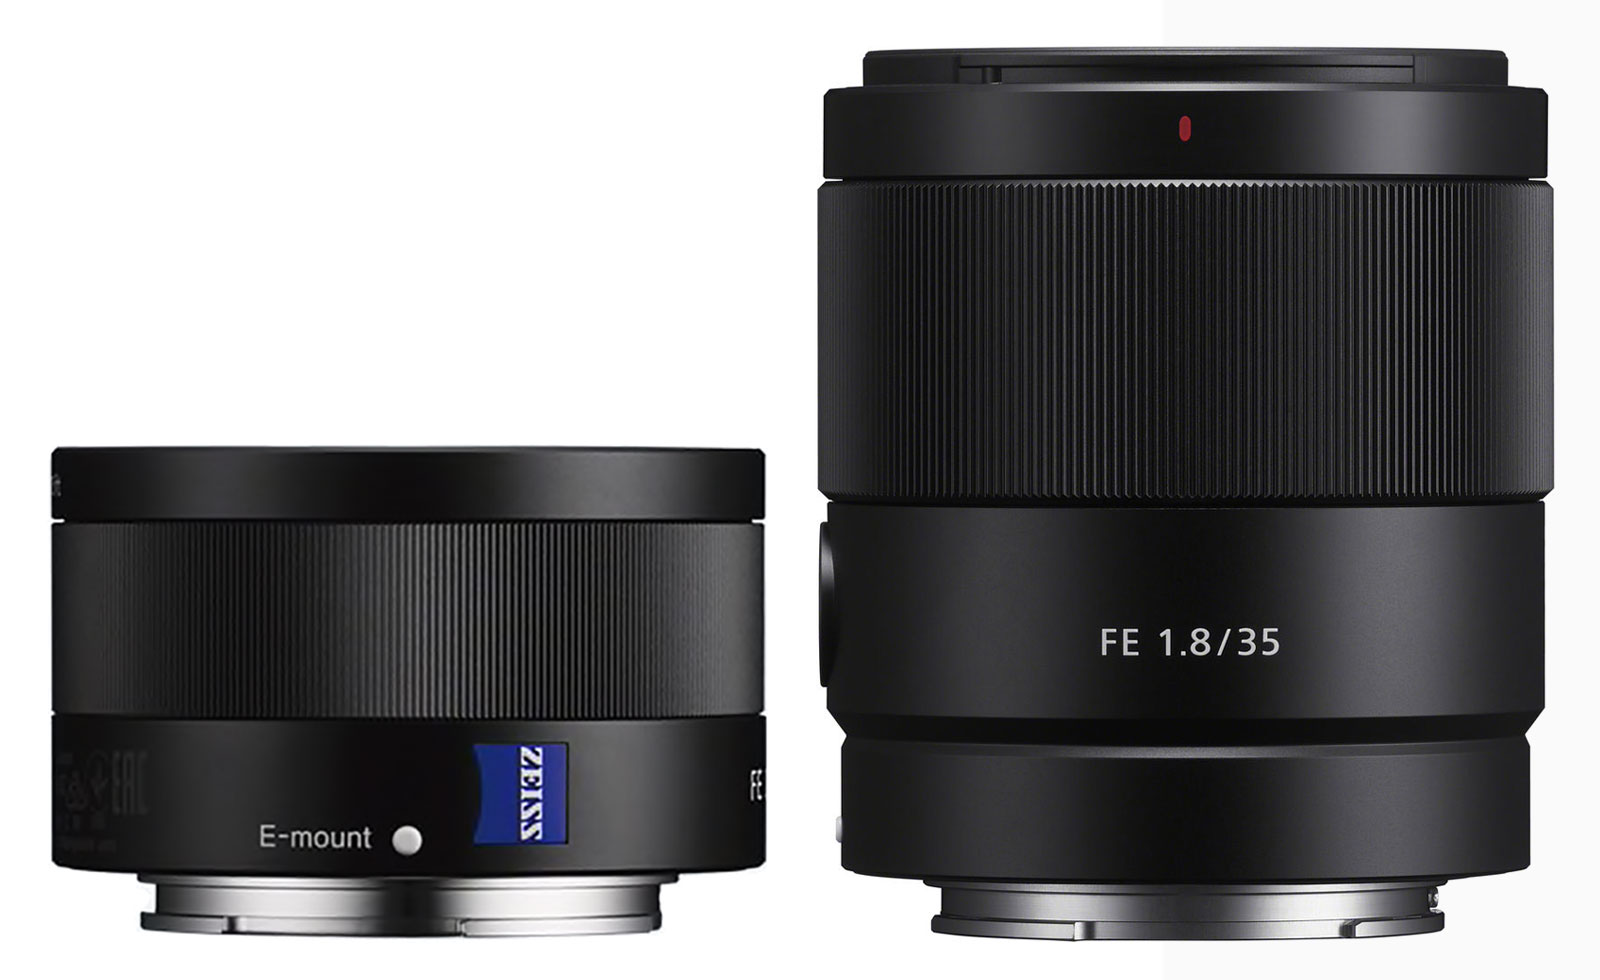 Sony Sonnar T* FE 35mm F2.8 ZA vs Sony FE 35mm F1.8